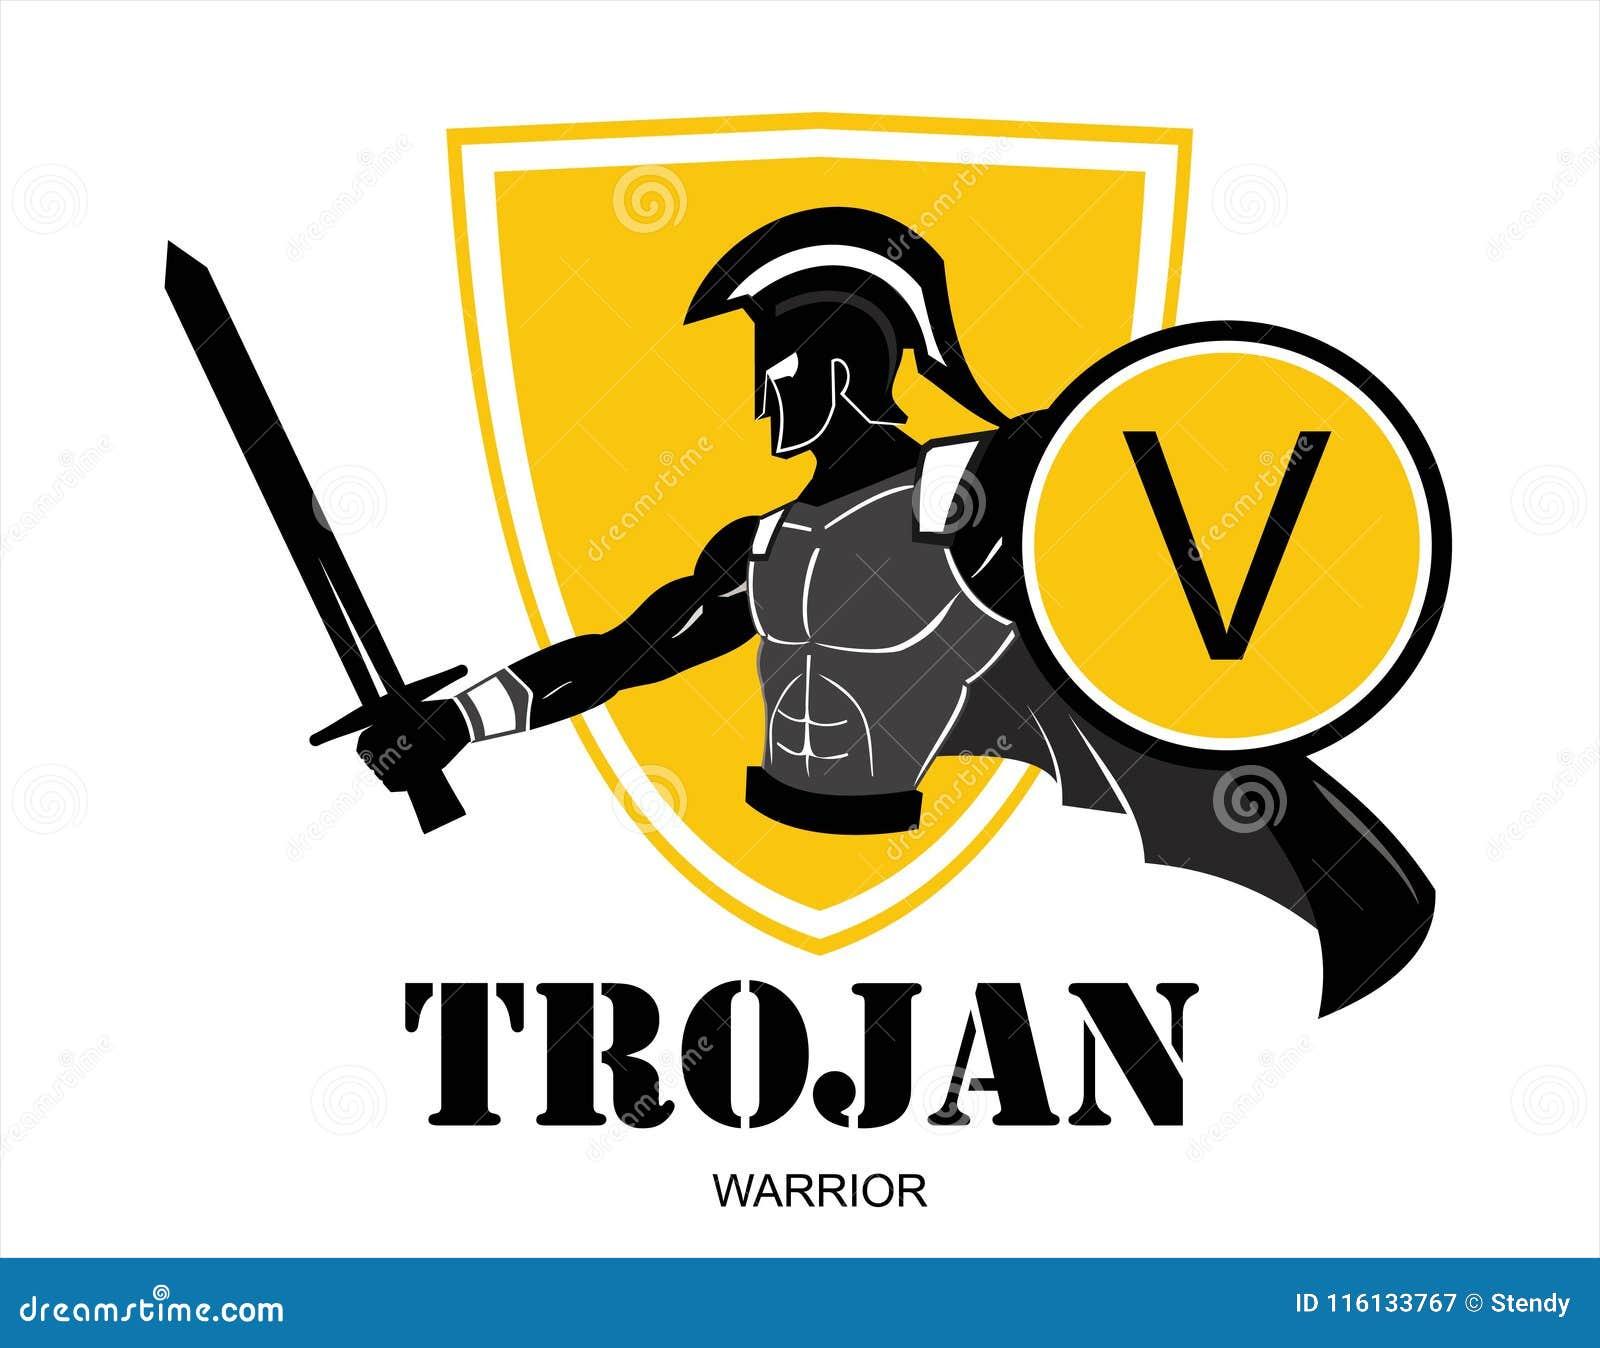 trojan sword and shield - 800×629